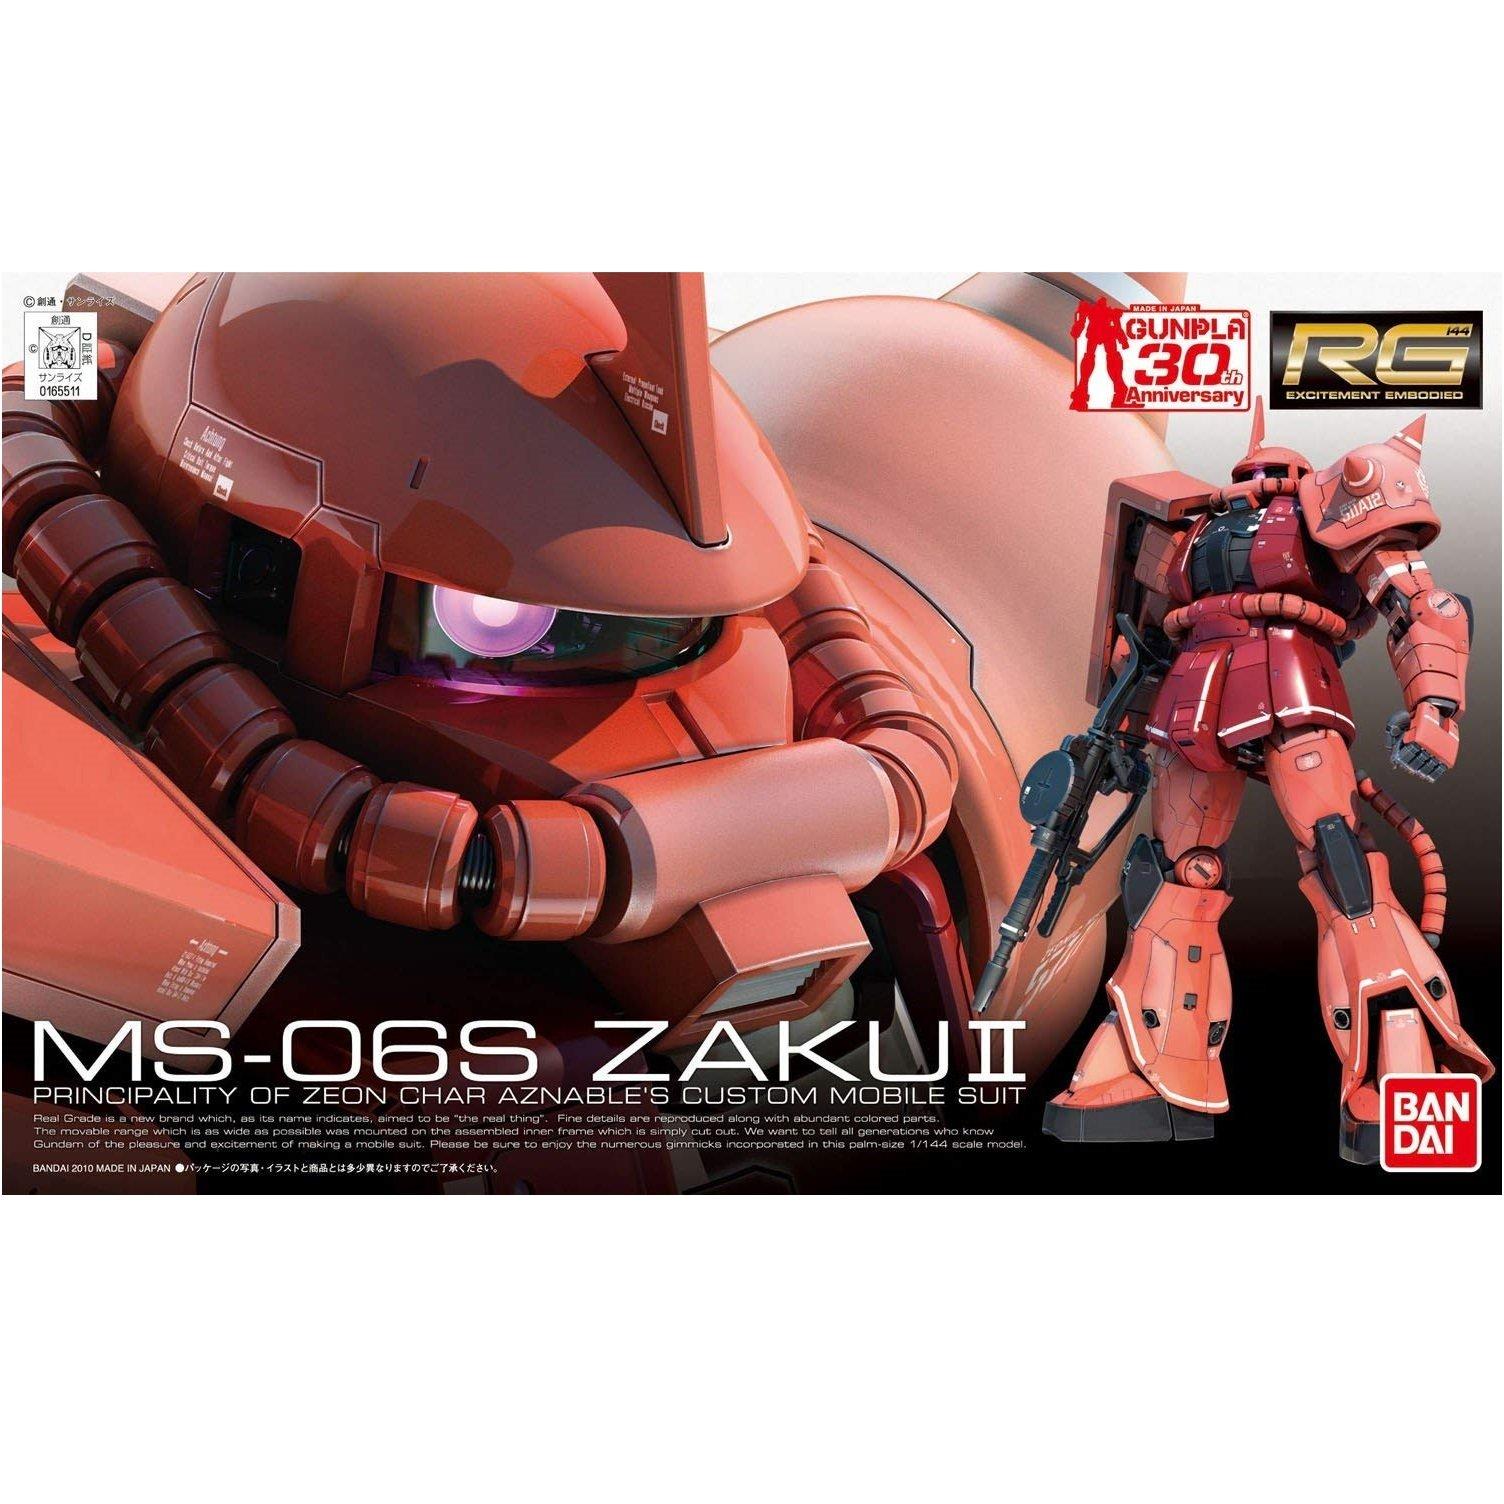 BANDAI 鋼彈 RG版 1/144 #02 MS-06S ZAKU II